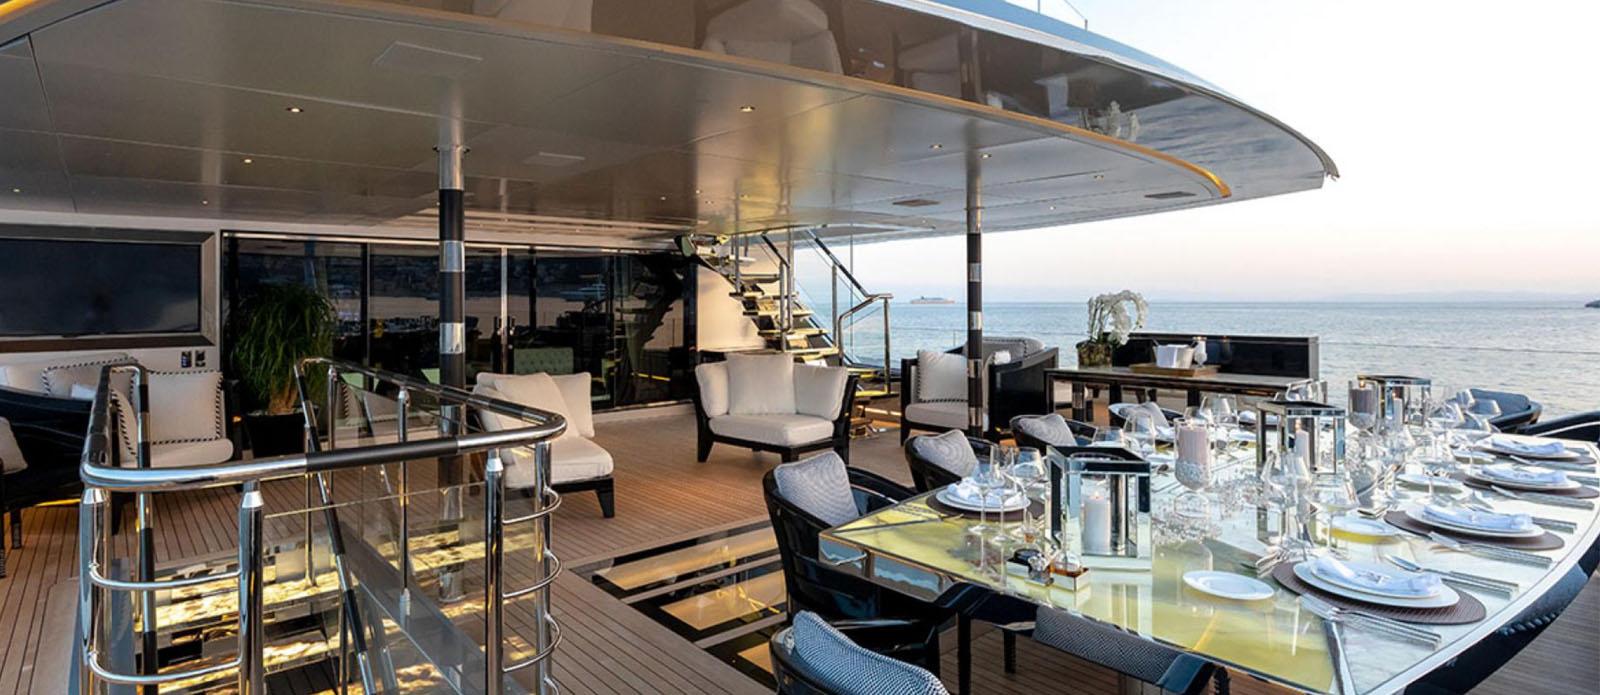 Sarastar -Exterior Dining